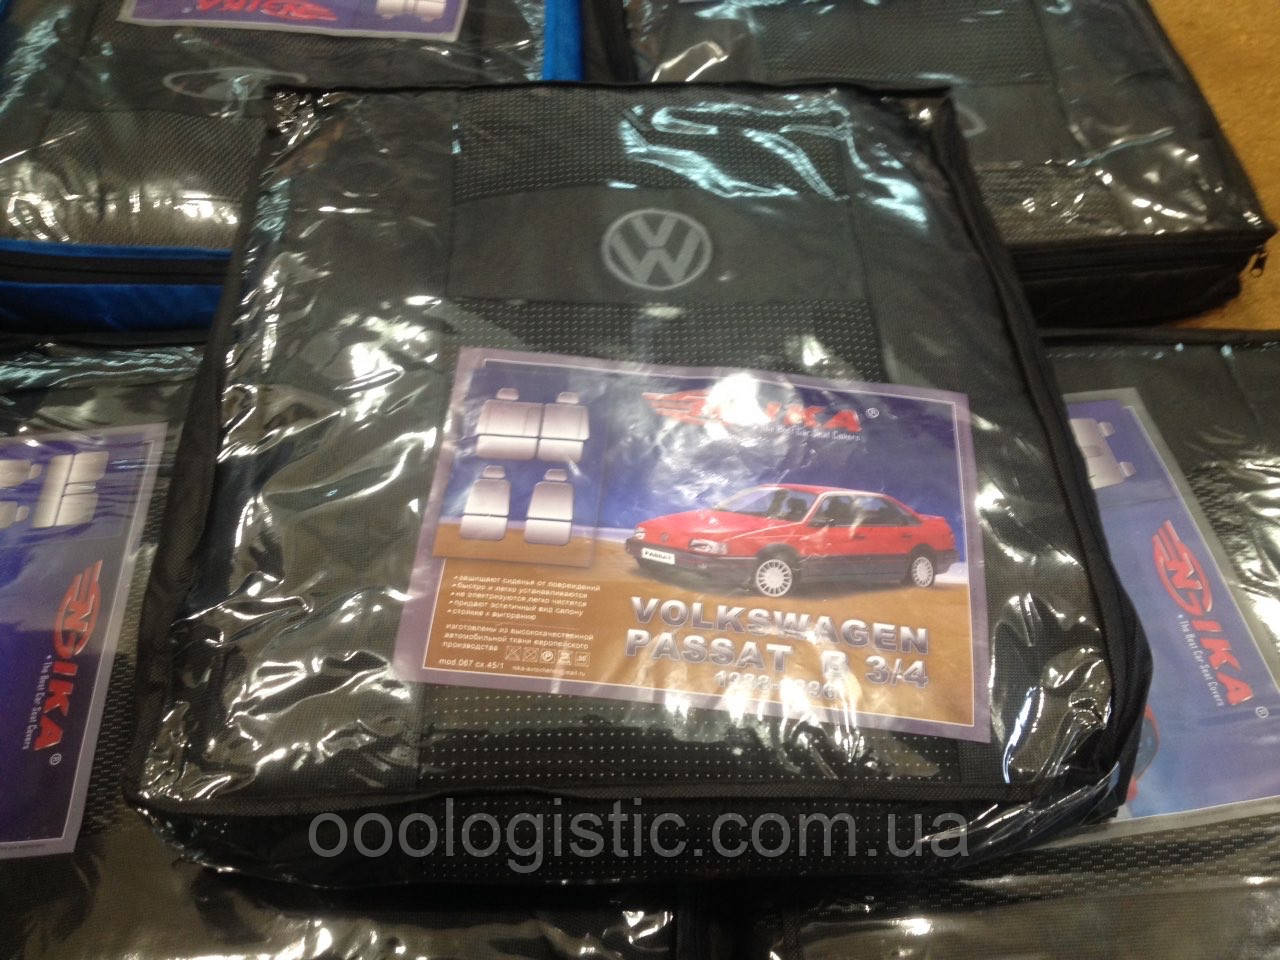 Авточохли на Volkswagen Passat B3/4 1988-1996 року Nika